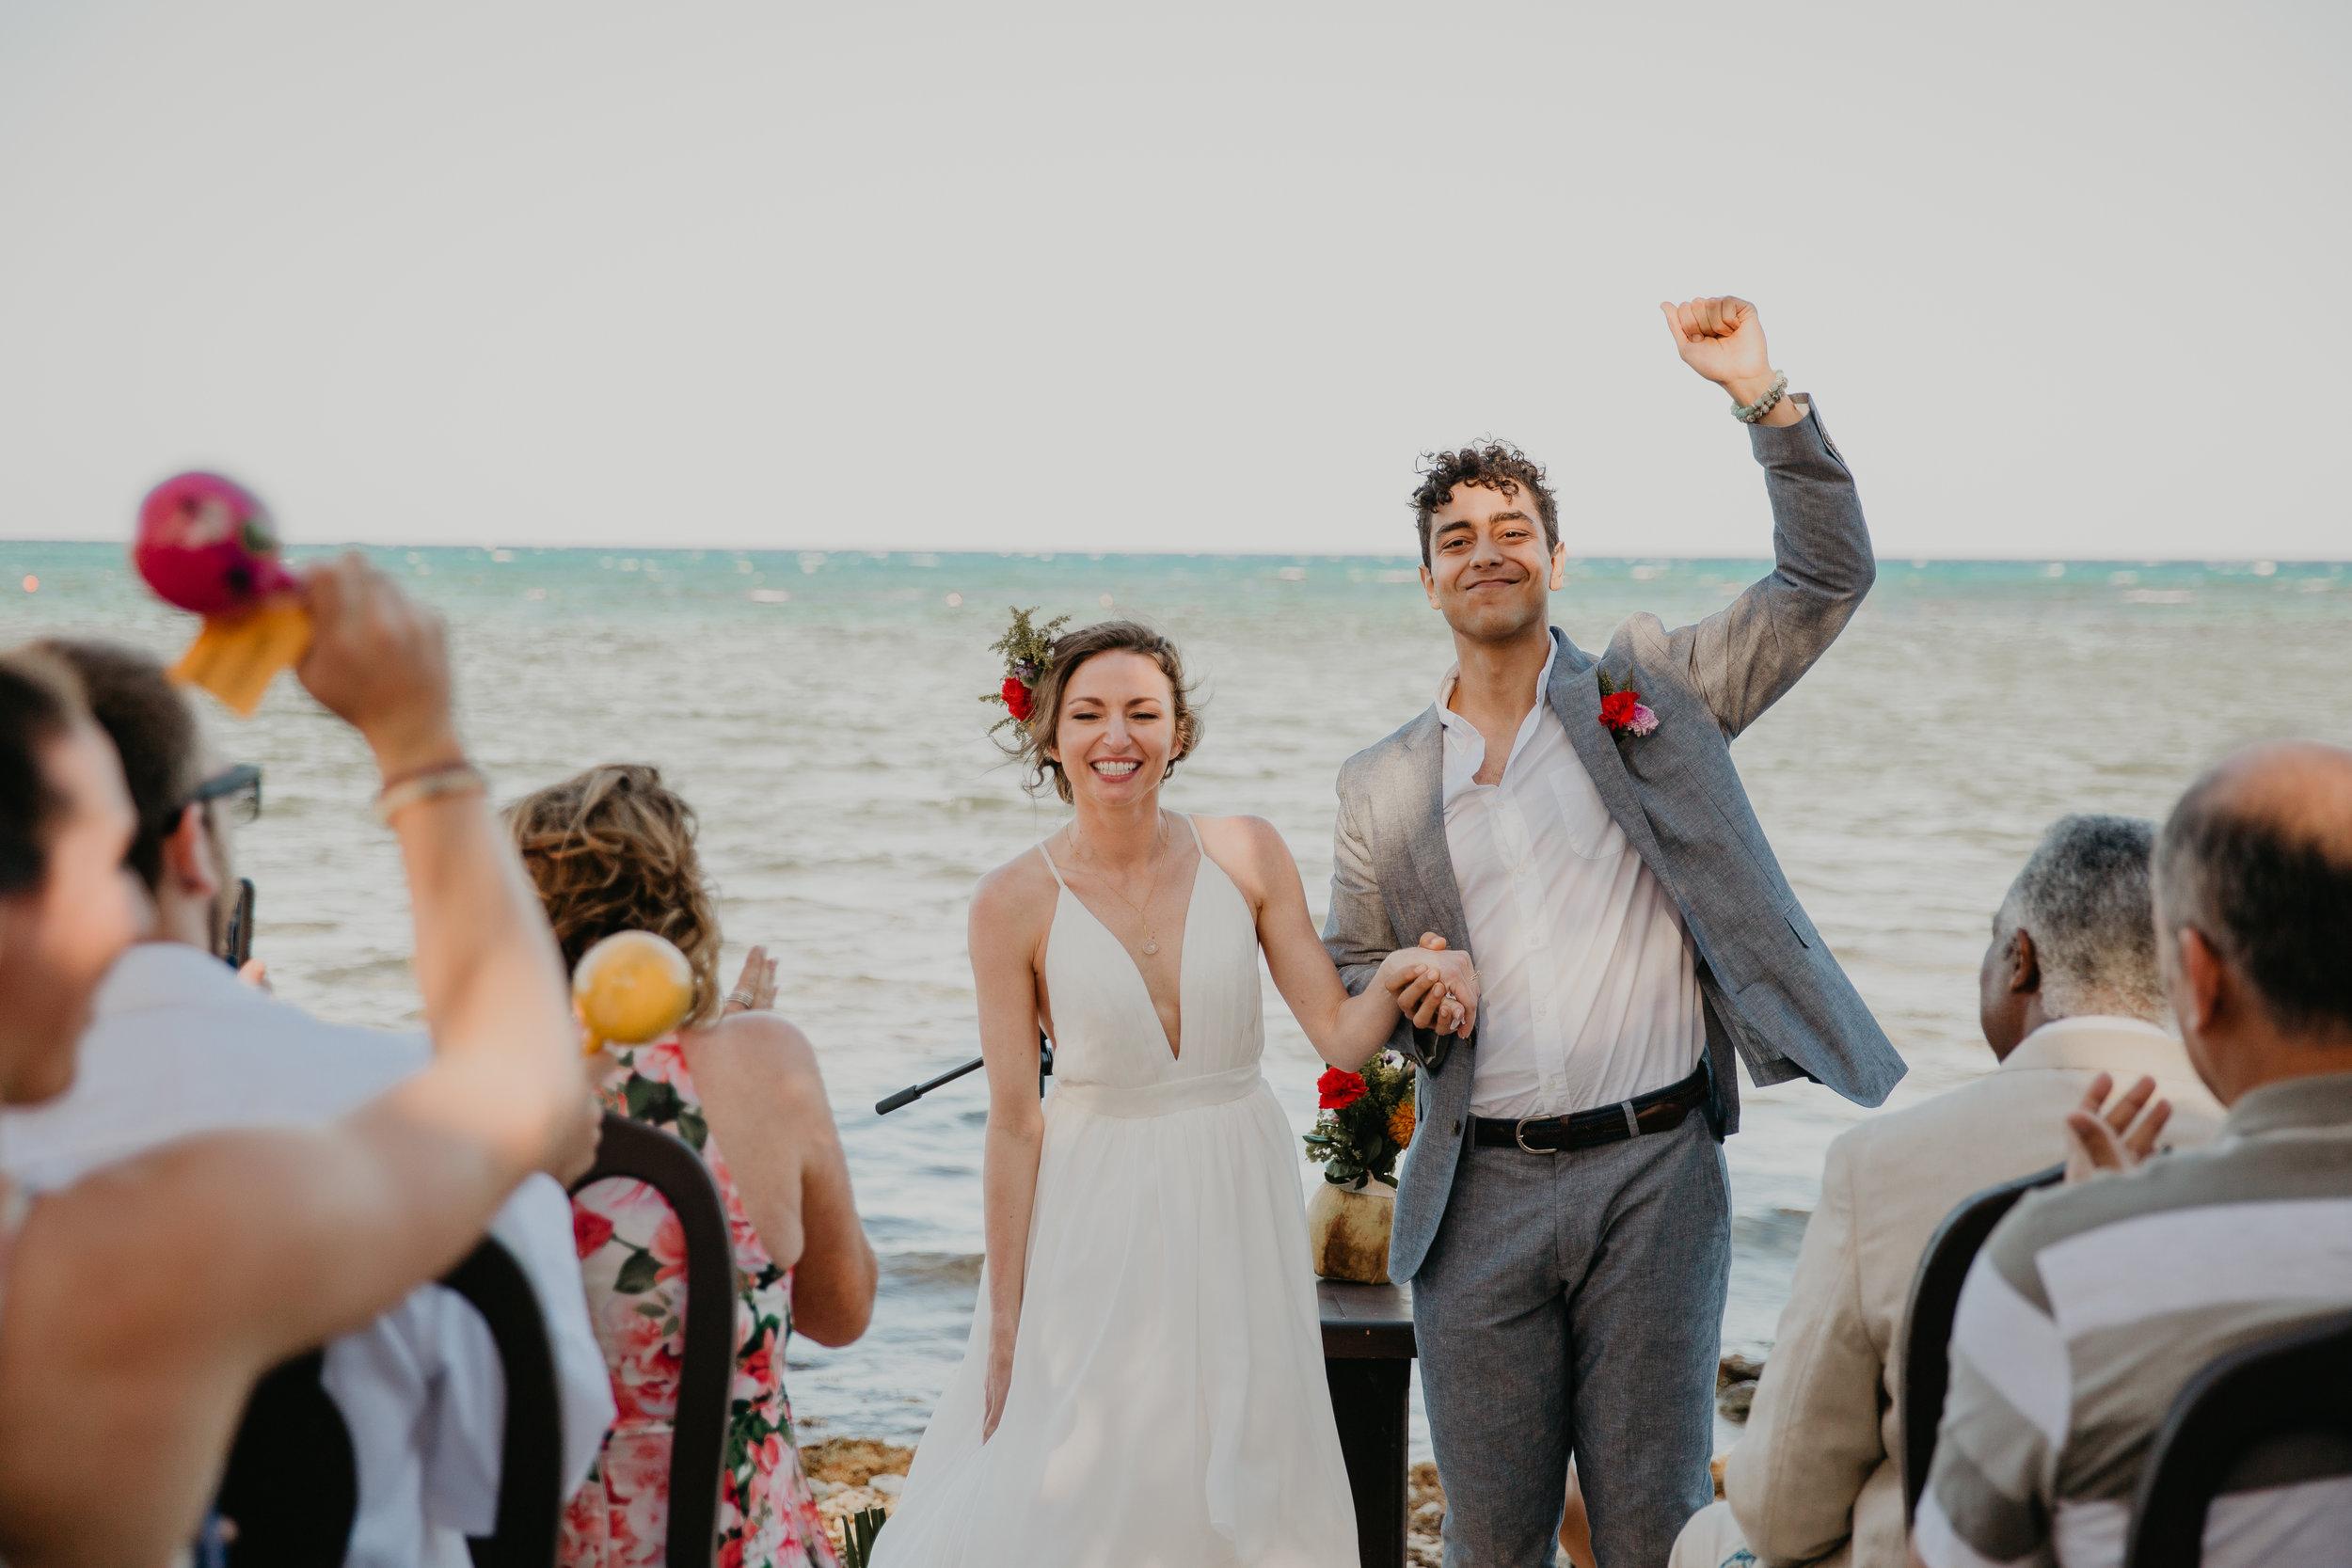 Nicole-Daacke-Photography-beachfront-akumal-destionation-wedding-tulum-mexico-elopement-photographer-destination-wedding-inspiration-sunset-champagne-pop-boho-bride-ocean-tropical-bohemian-tulum-wedding-photos-171.jpg